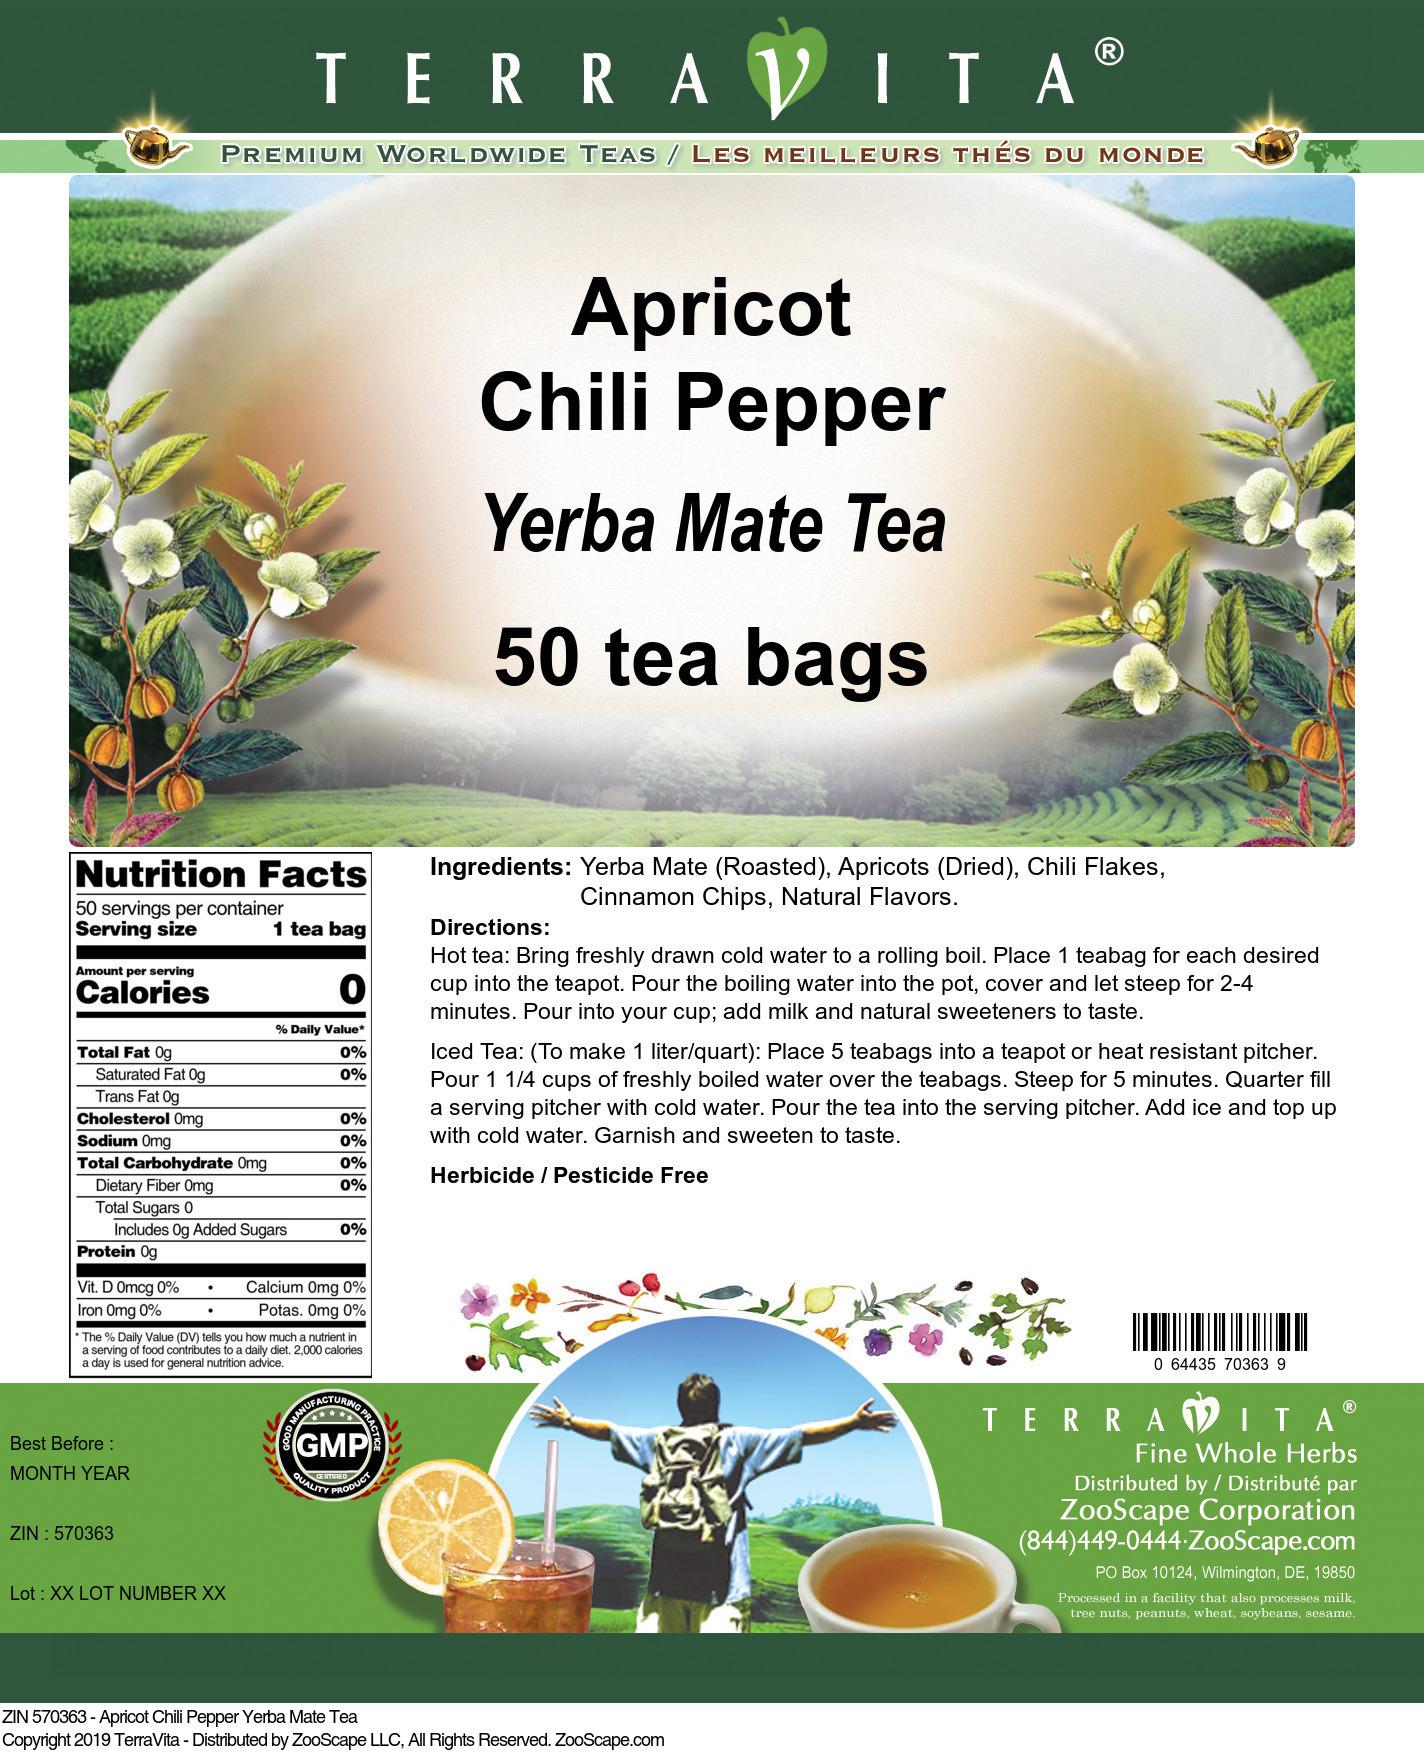 Apricot Chili Pepper Yerba Mate